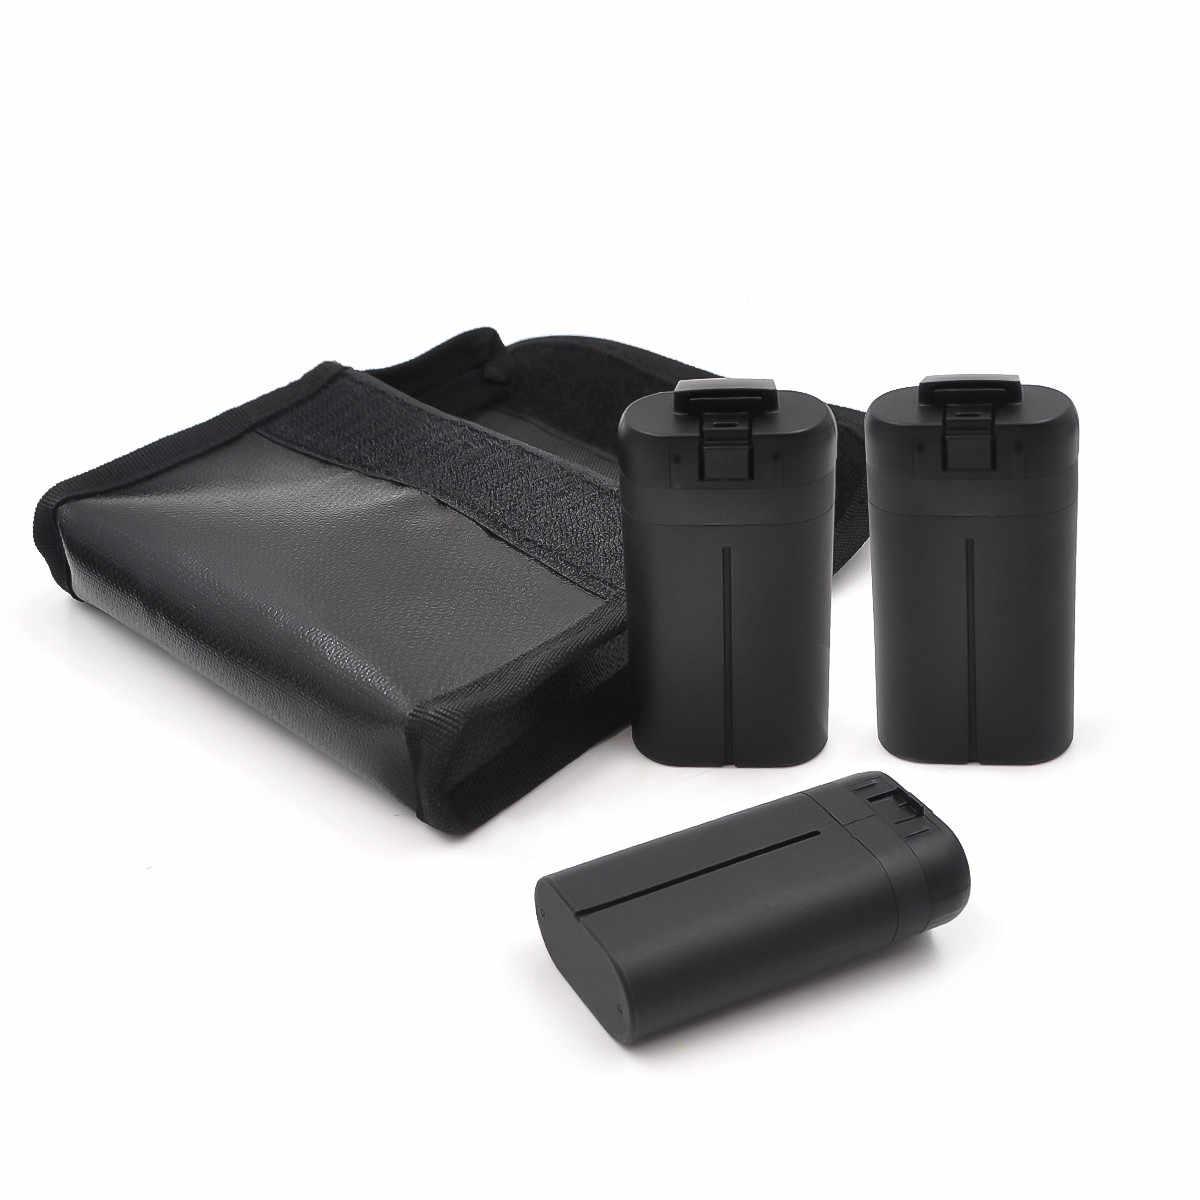 Batterie étui de protection sac de stockage LiPo sac sûr anti-déflagrant pour DJI Mavic Mini batterie 1125 #2